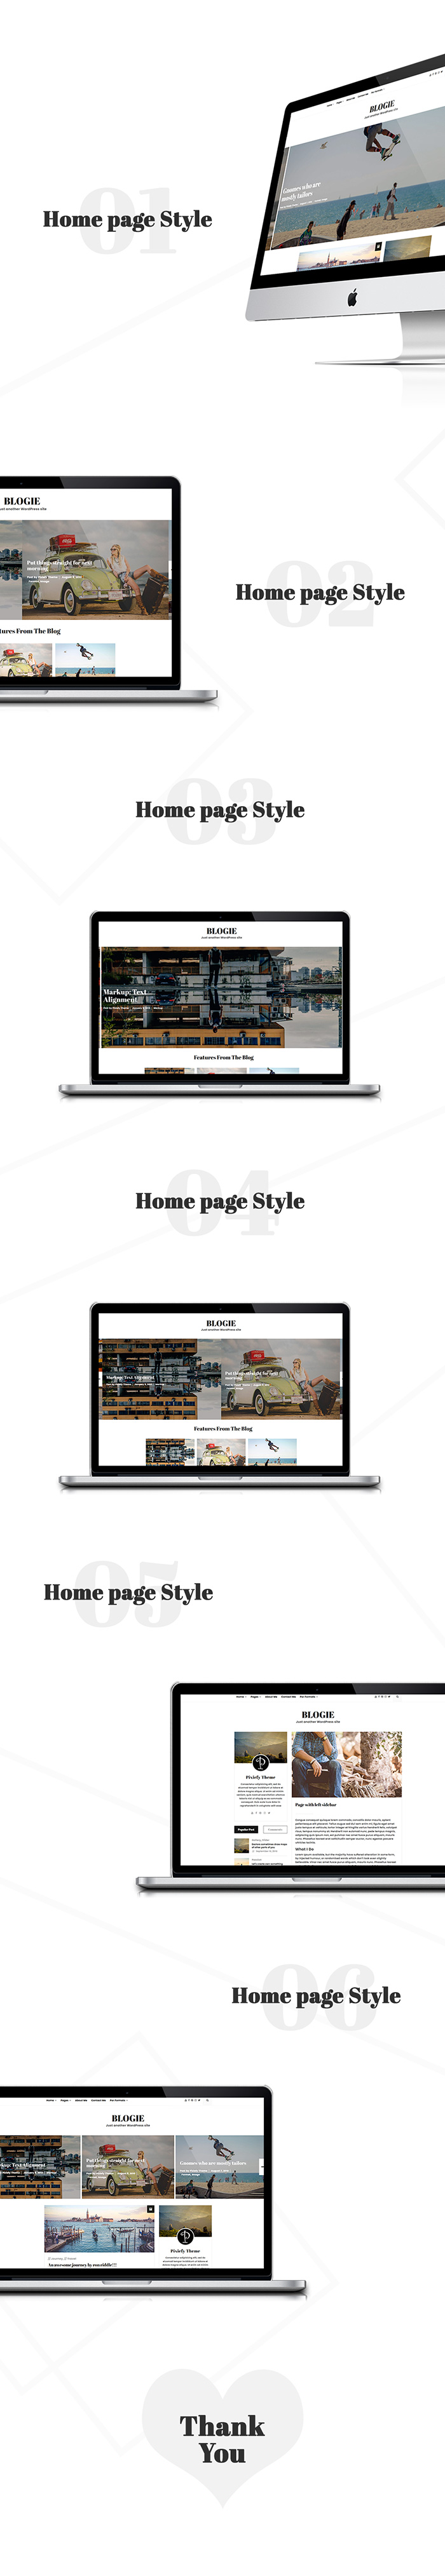 Blogie - Minimalist WordPress Blog theme - 1